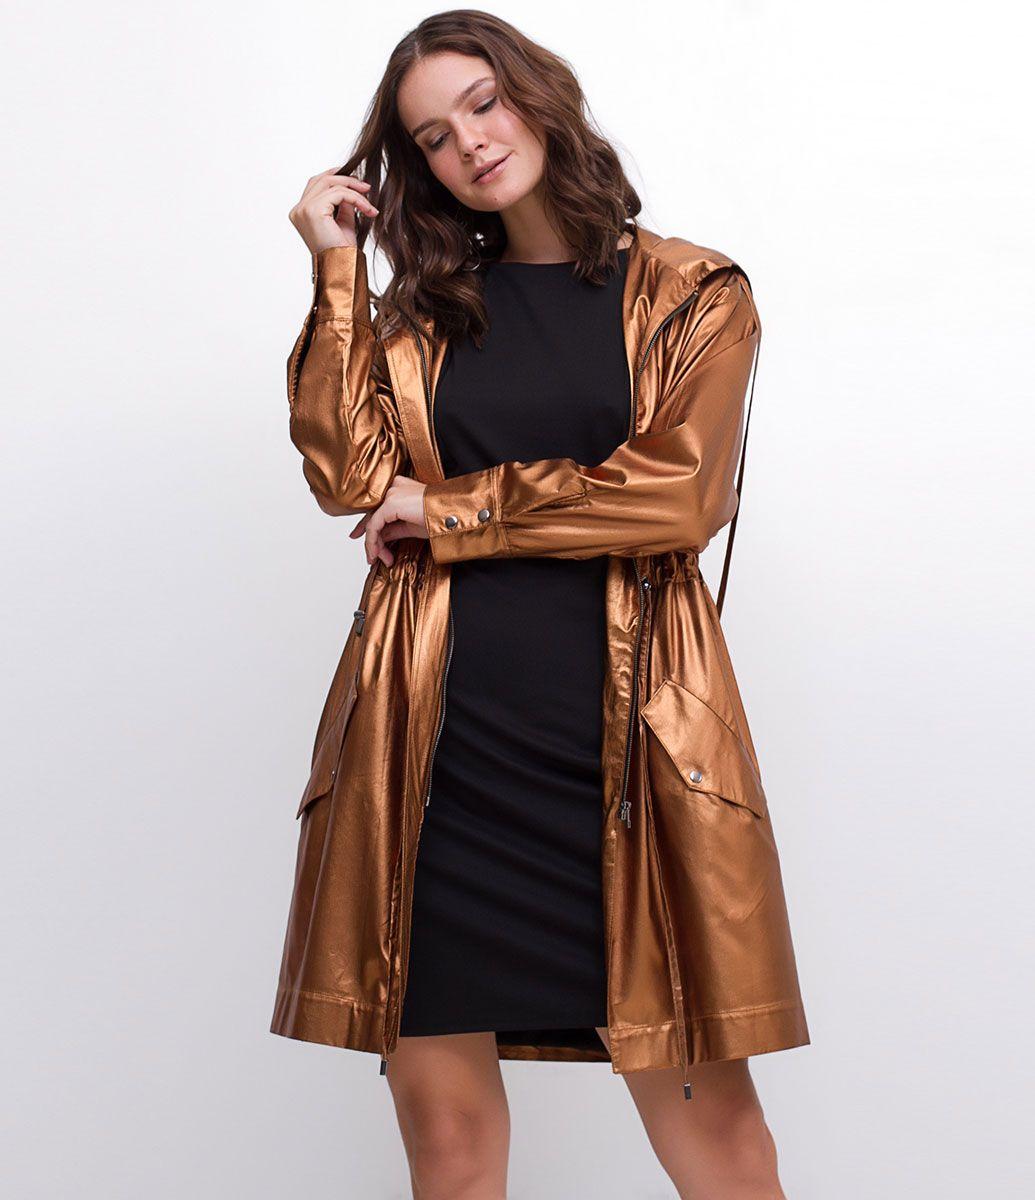 Jaqueta feminina modelo Parka metalizada  81899ebde59